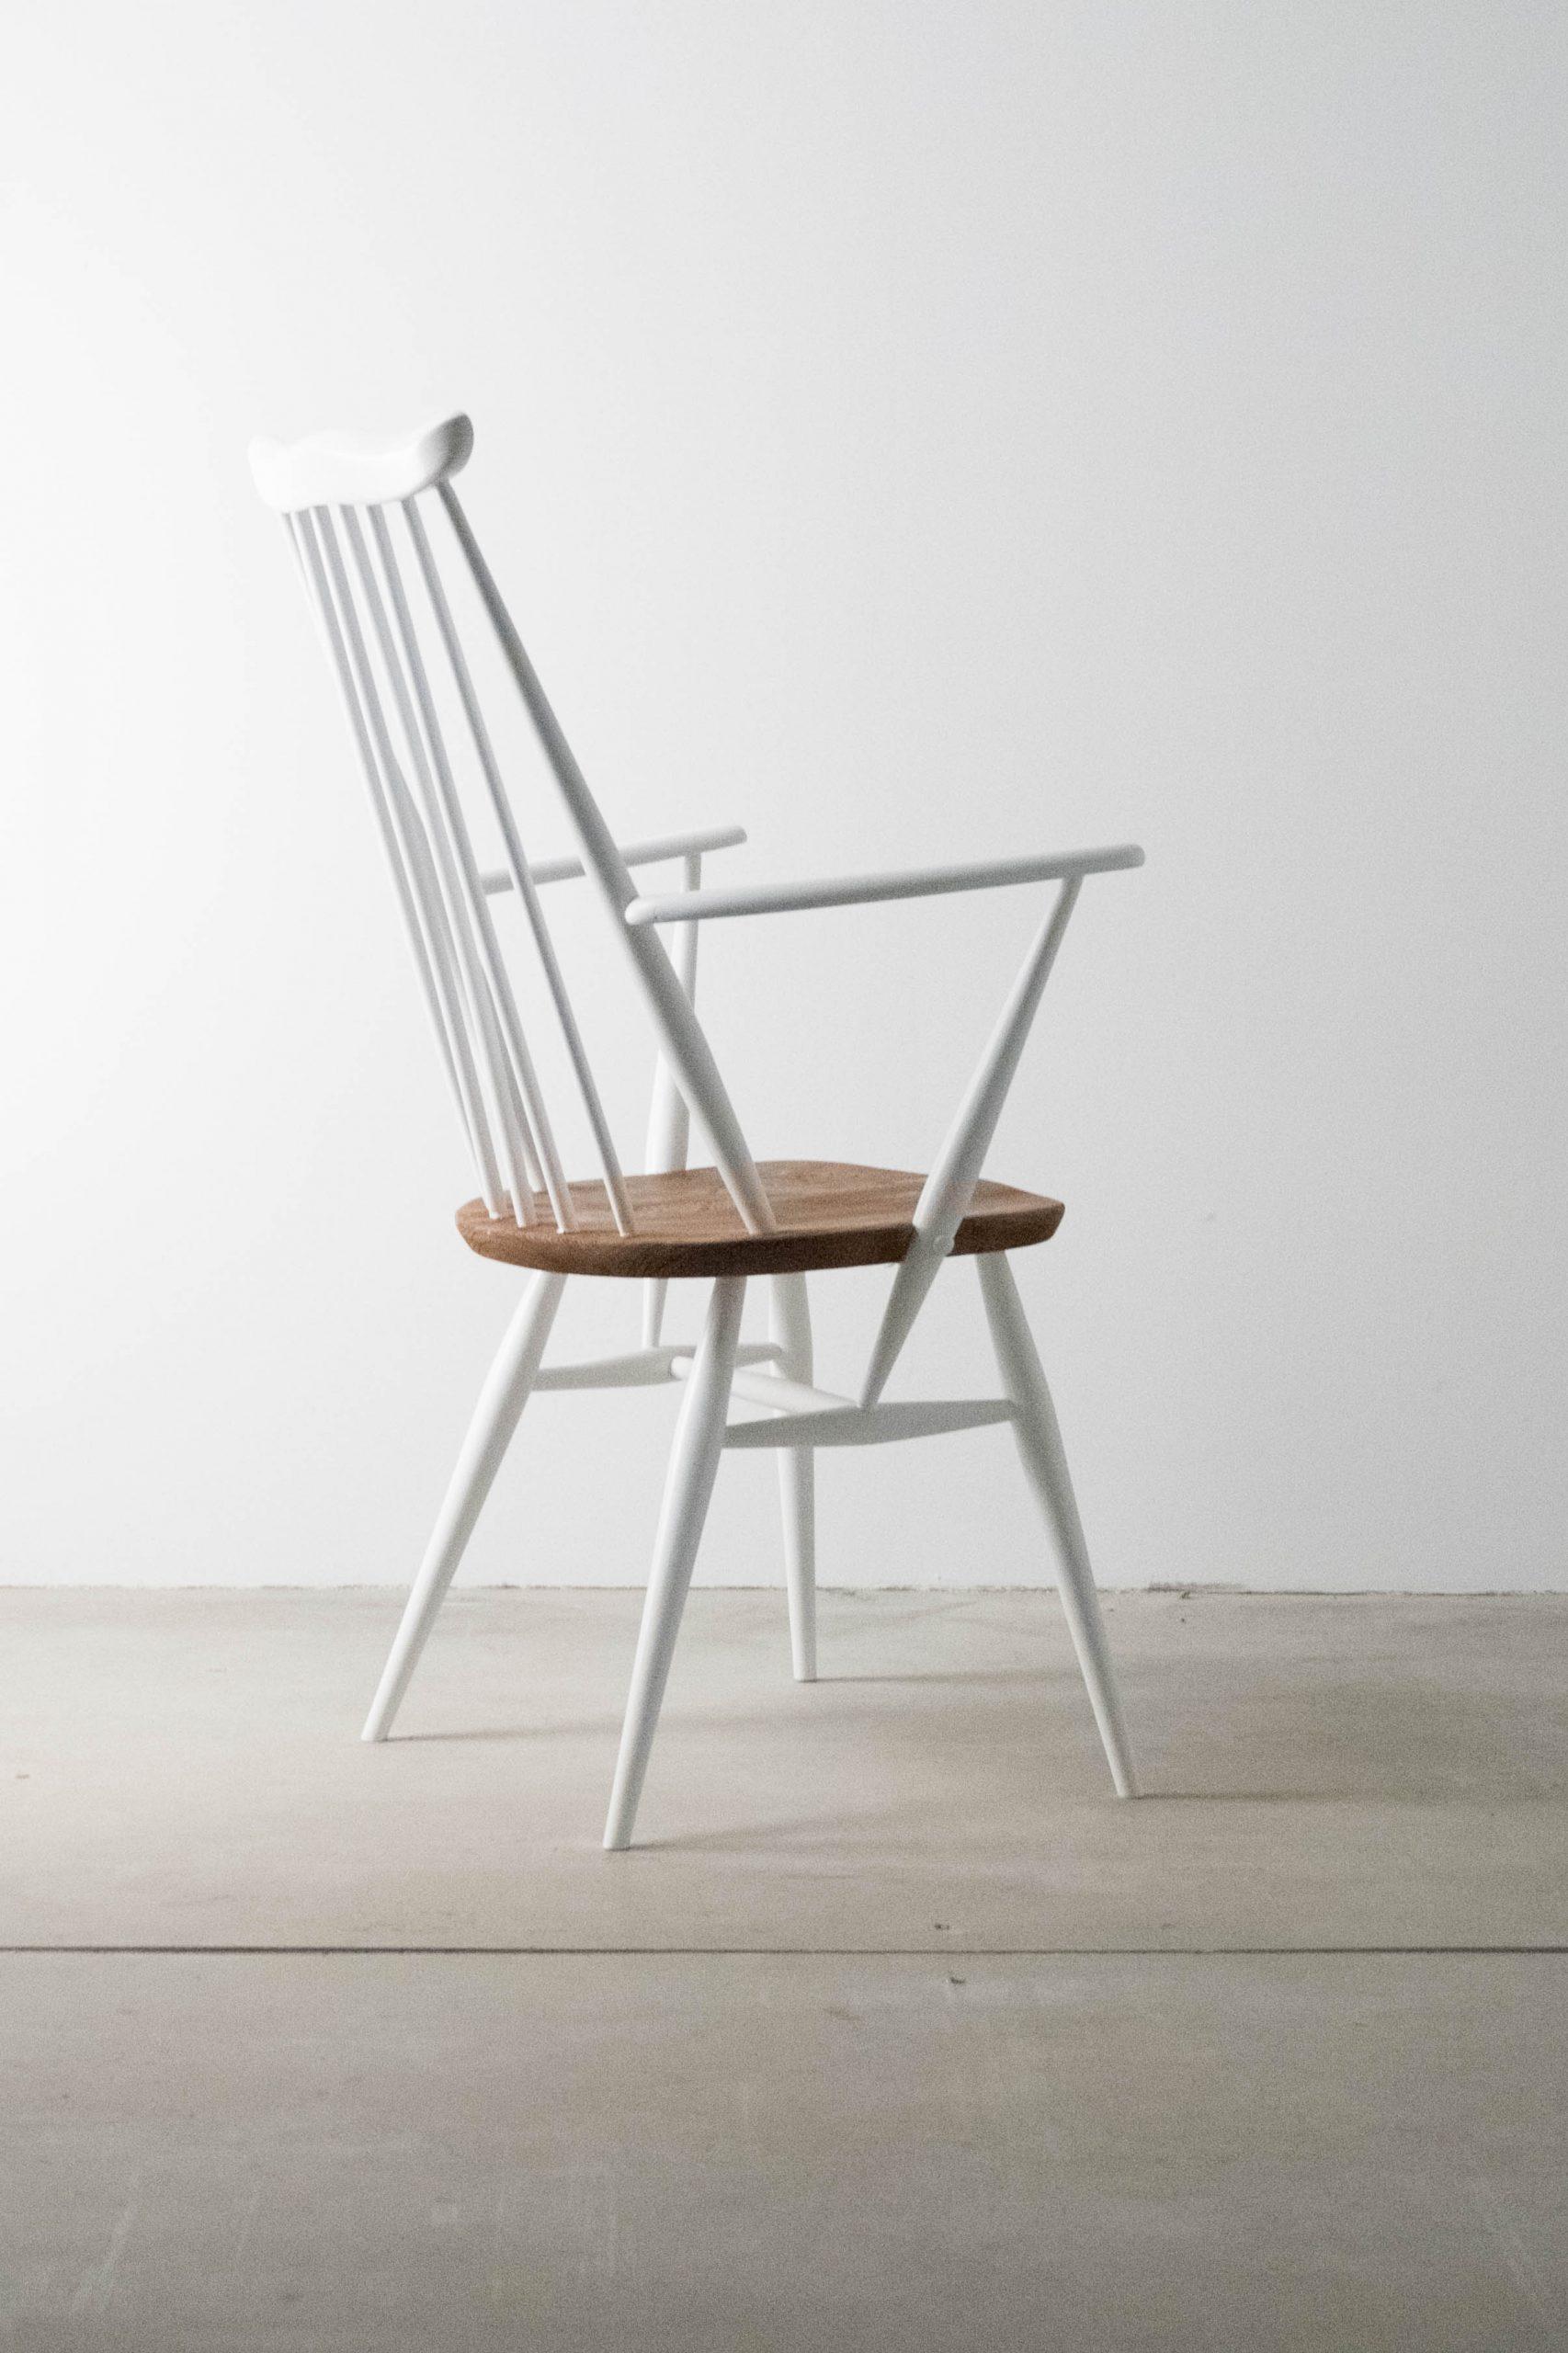 silla de diseño de madera de olmo ercol fabricada a mano en reino unido